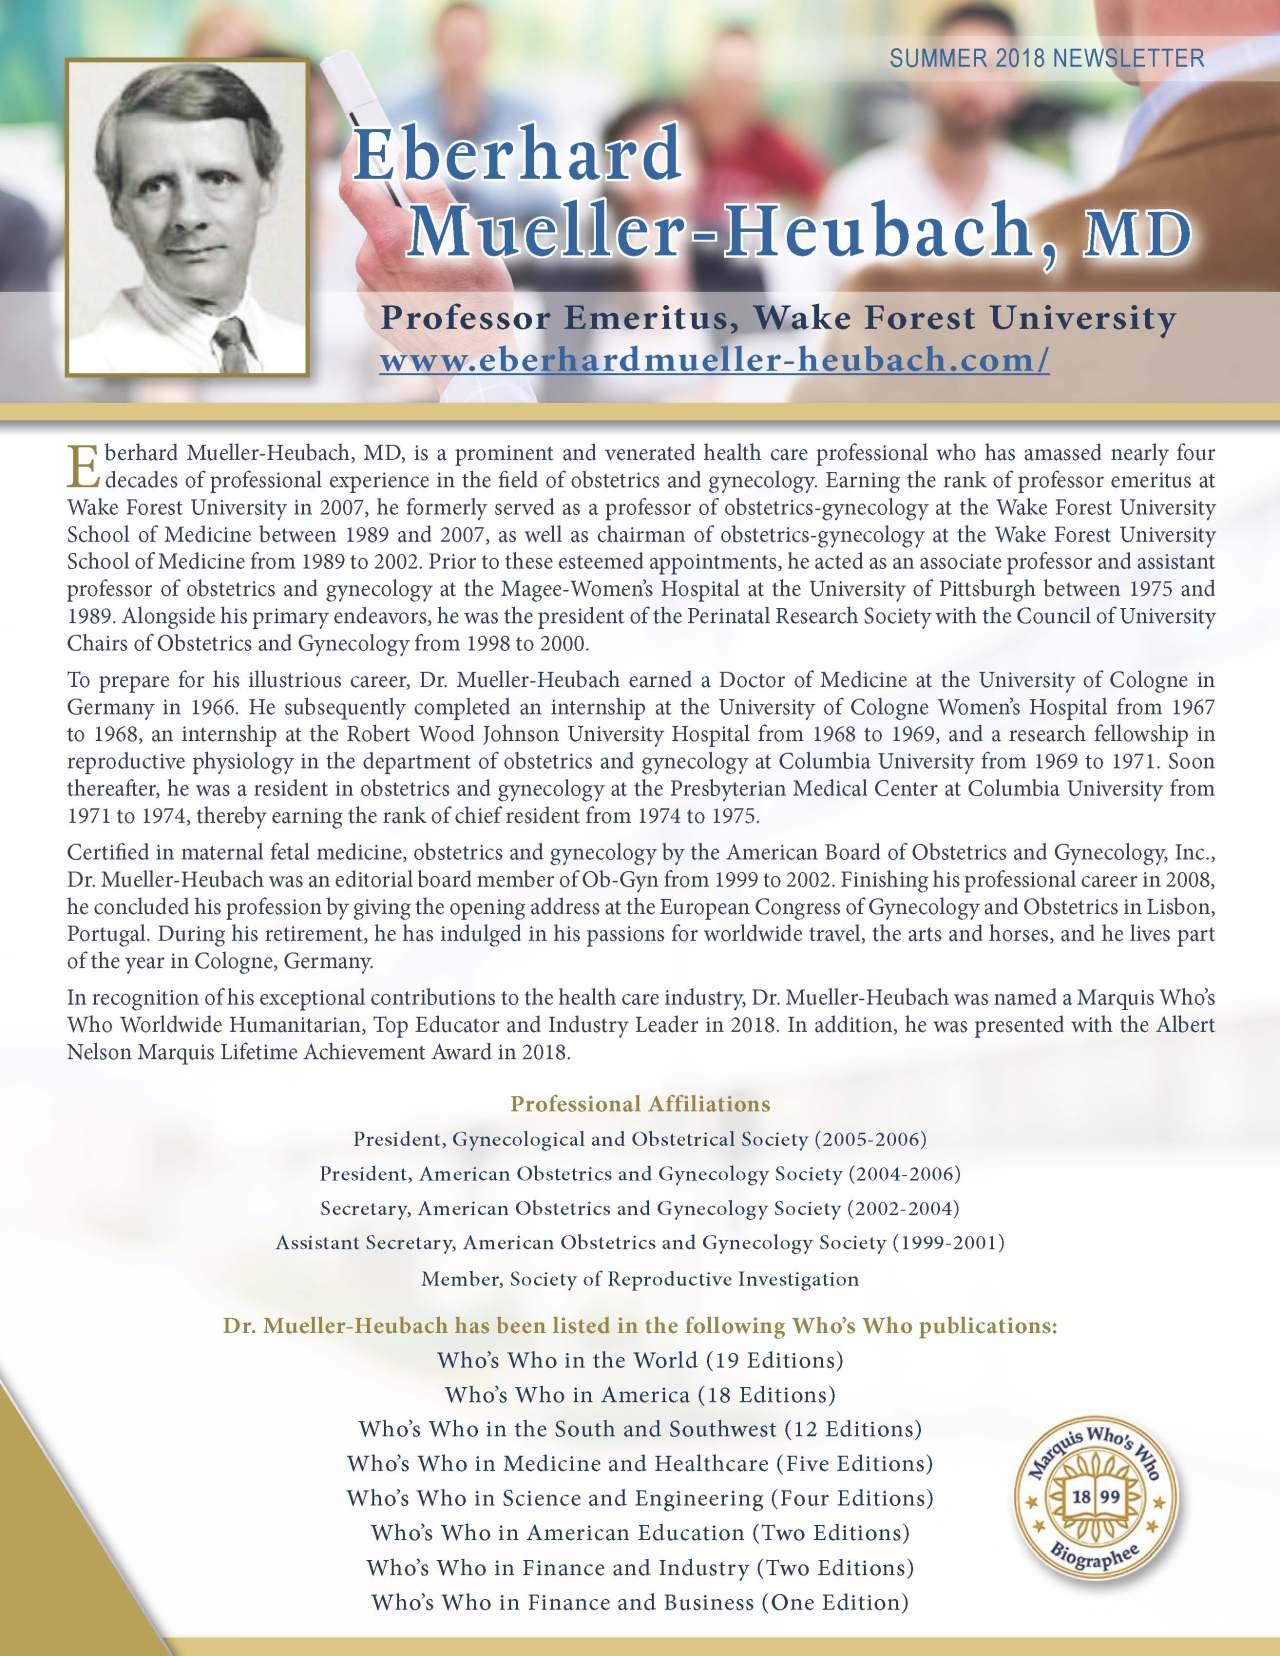 Eberhard Mueller-Heubach